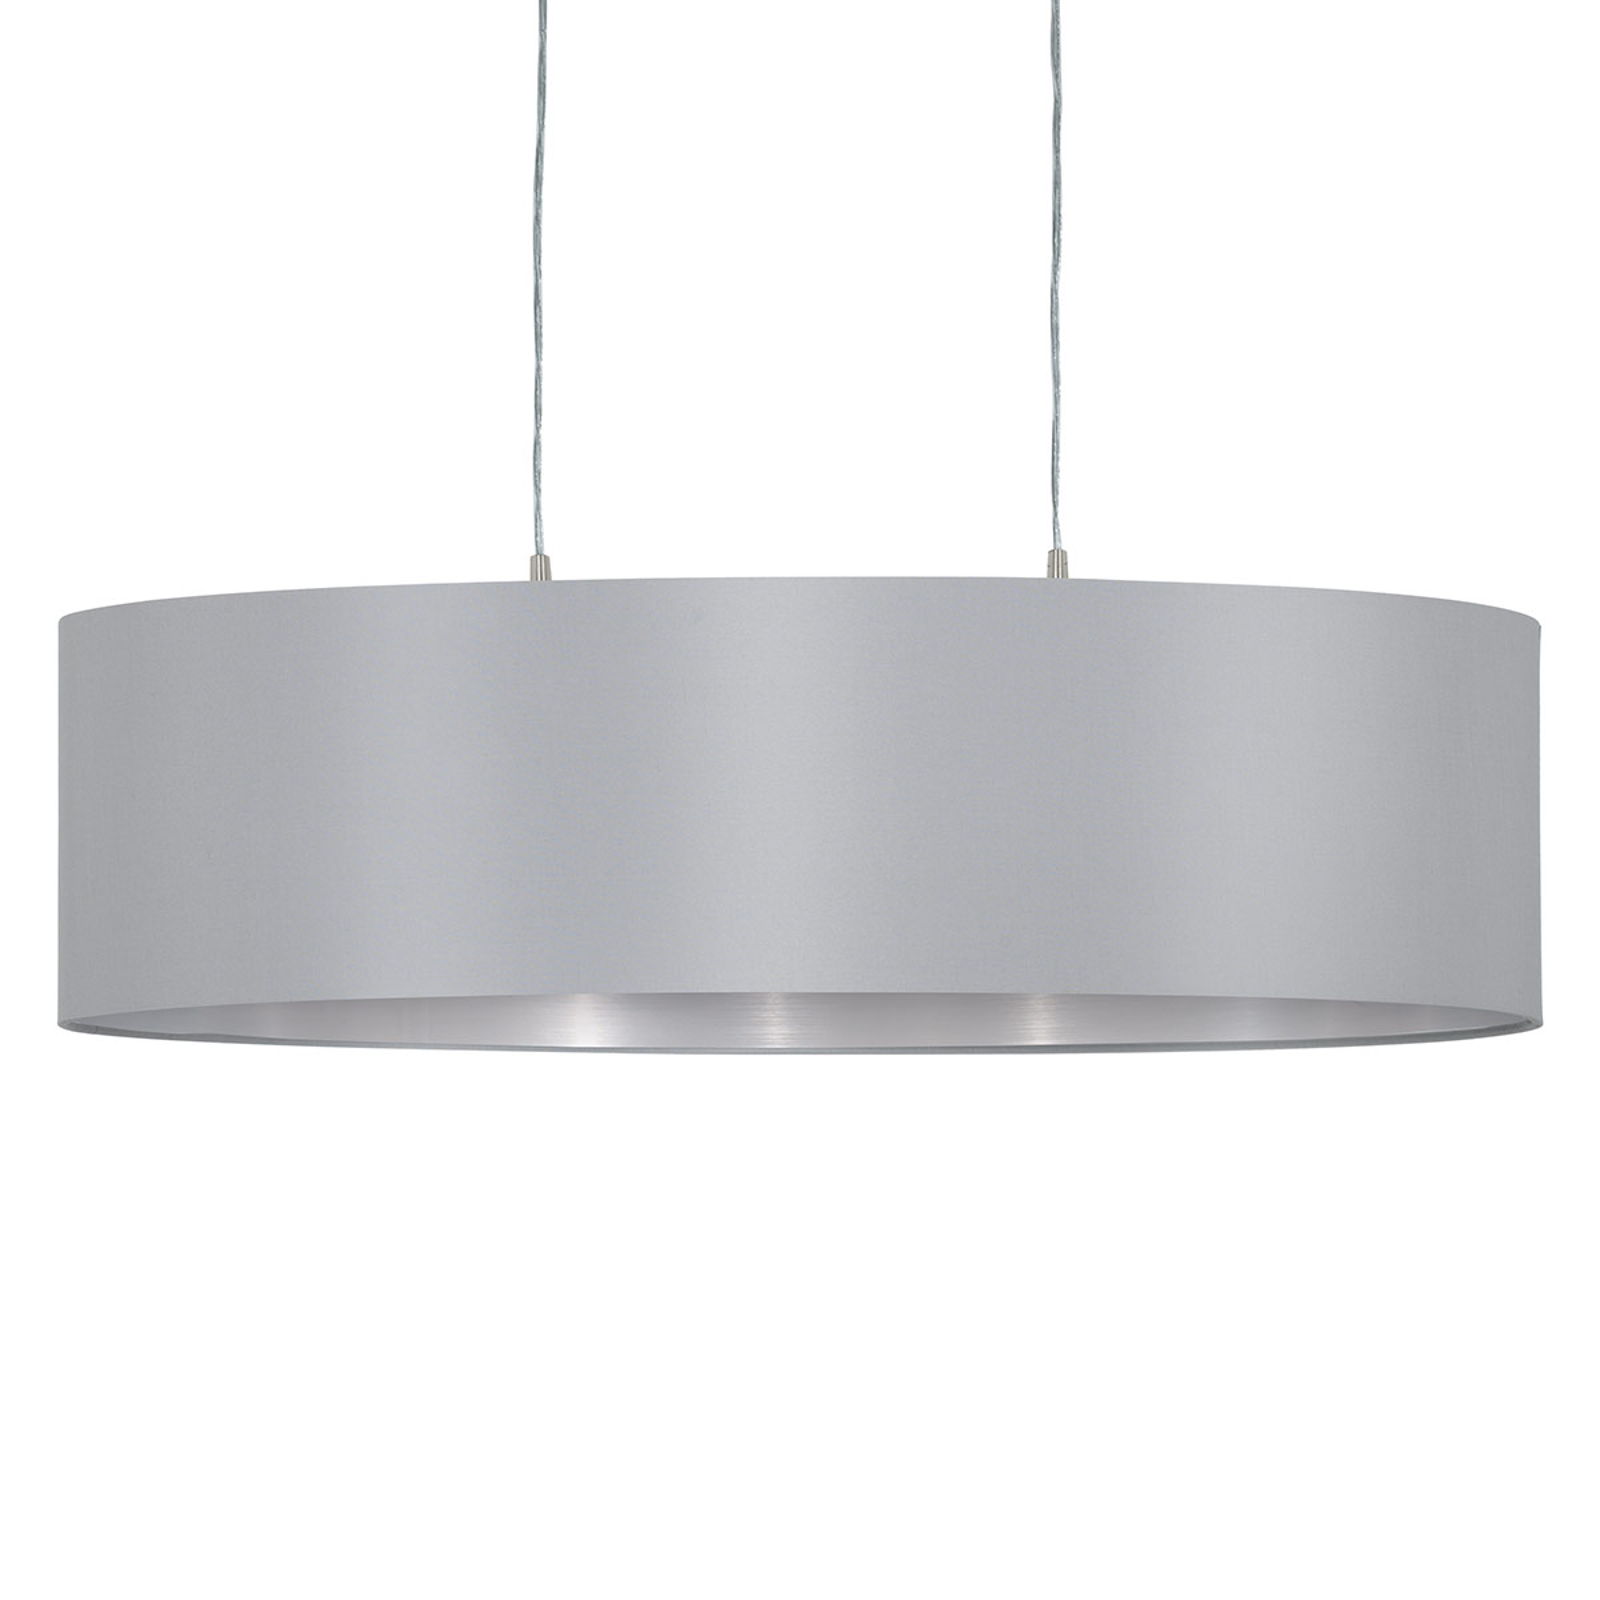 Lámpara colgante Maserlo oval, gris plateado